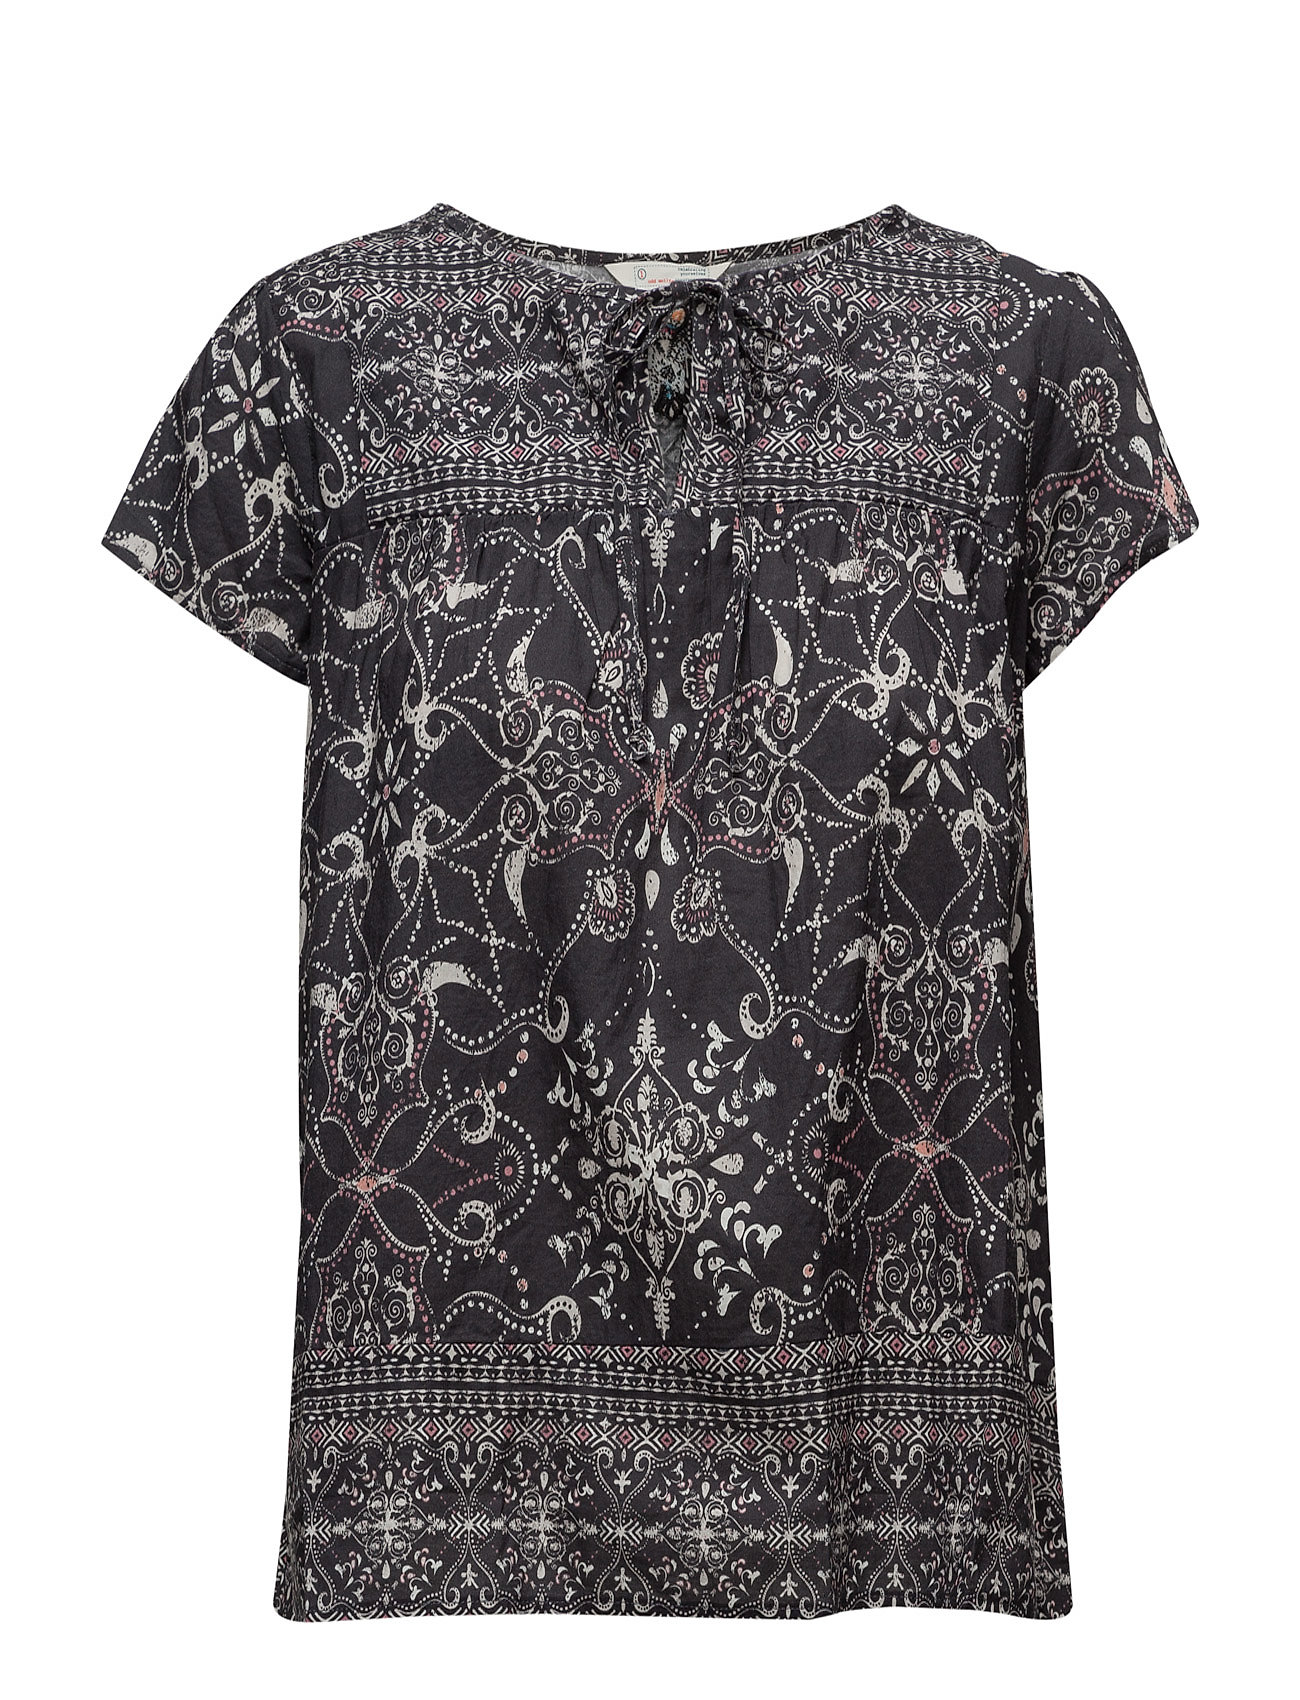 ODD MOLLY backbone blouse - ASPHALT